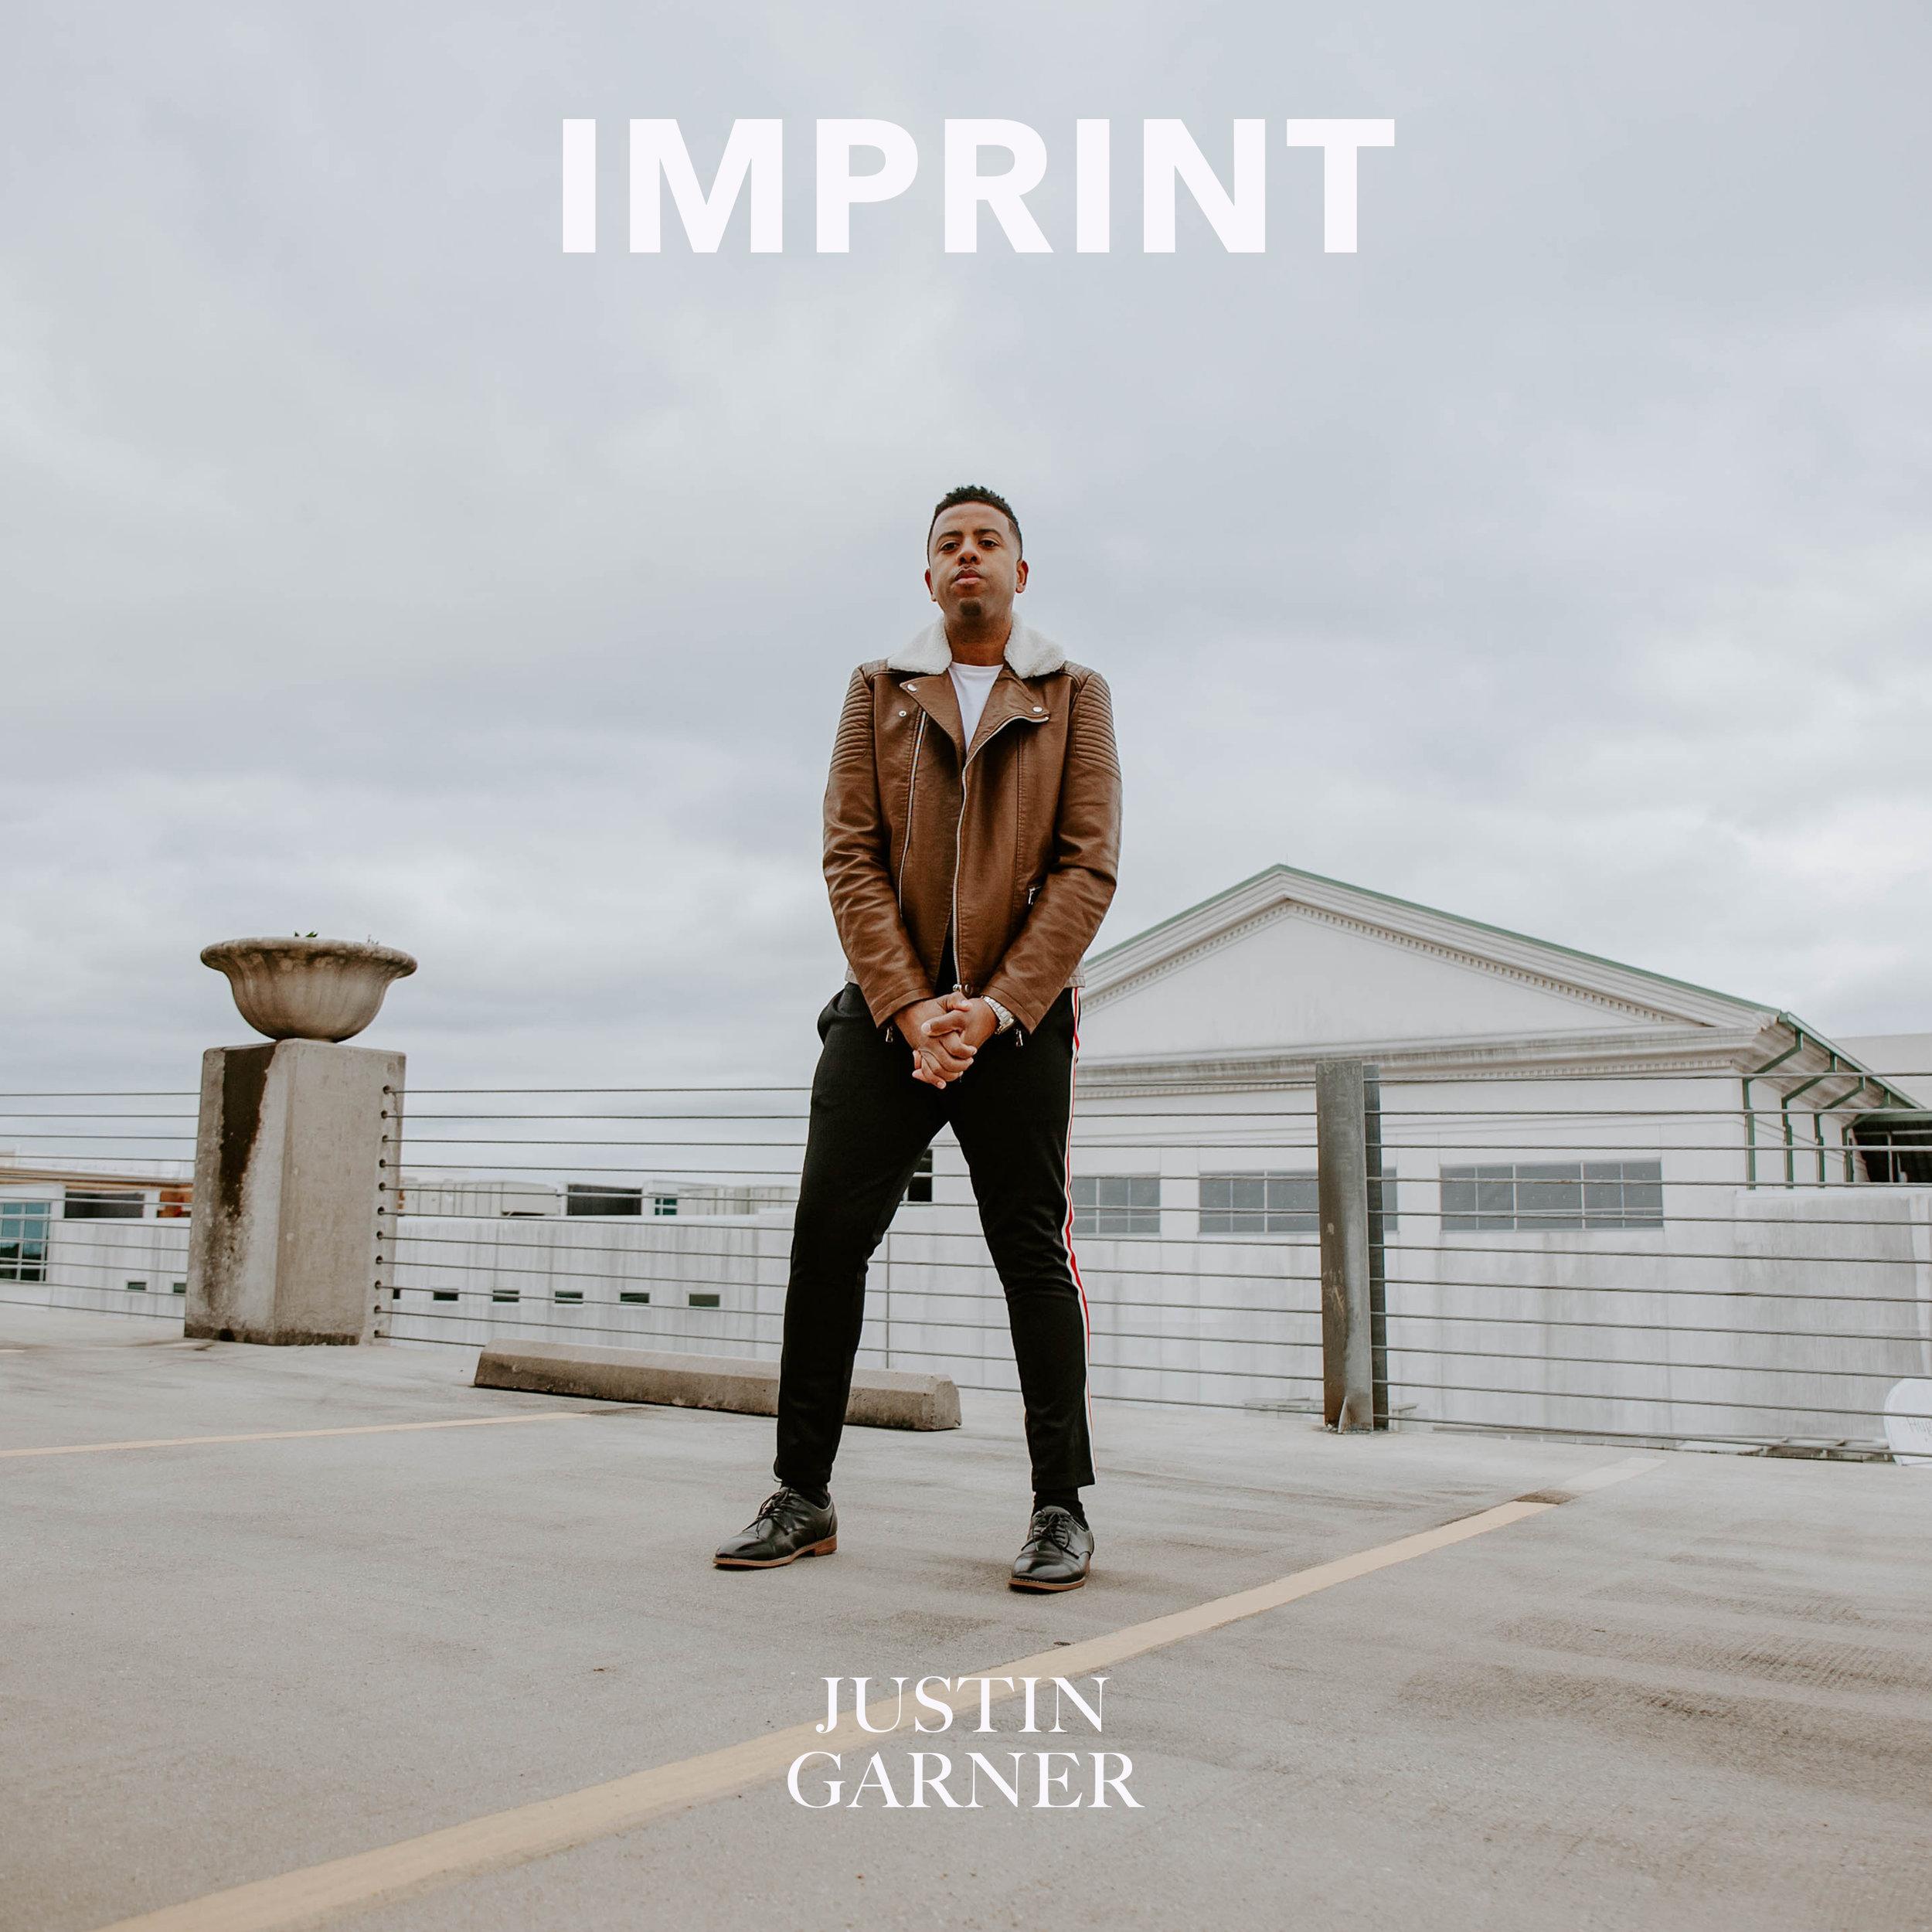 Justin Garner Imprint EP